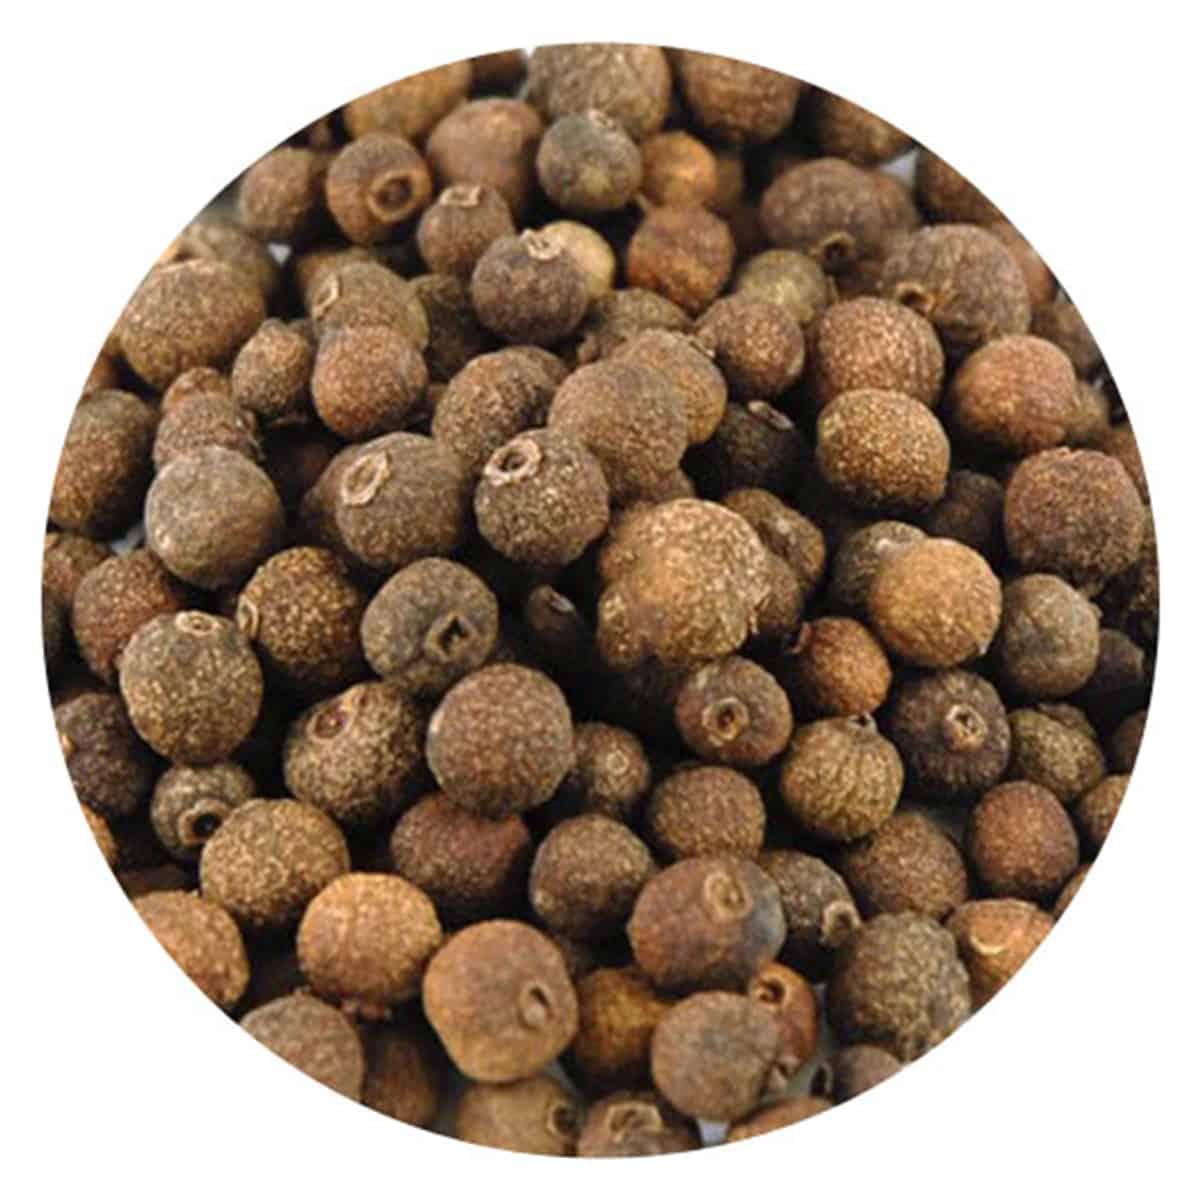 Buy IAG Foods Allspice (Pimento) Whole - 1 kg